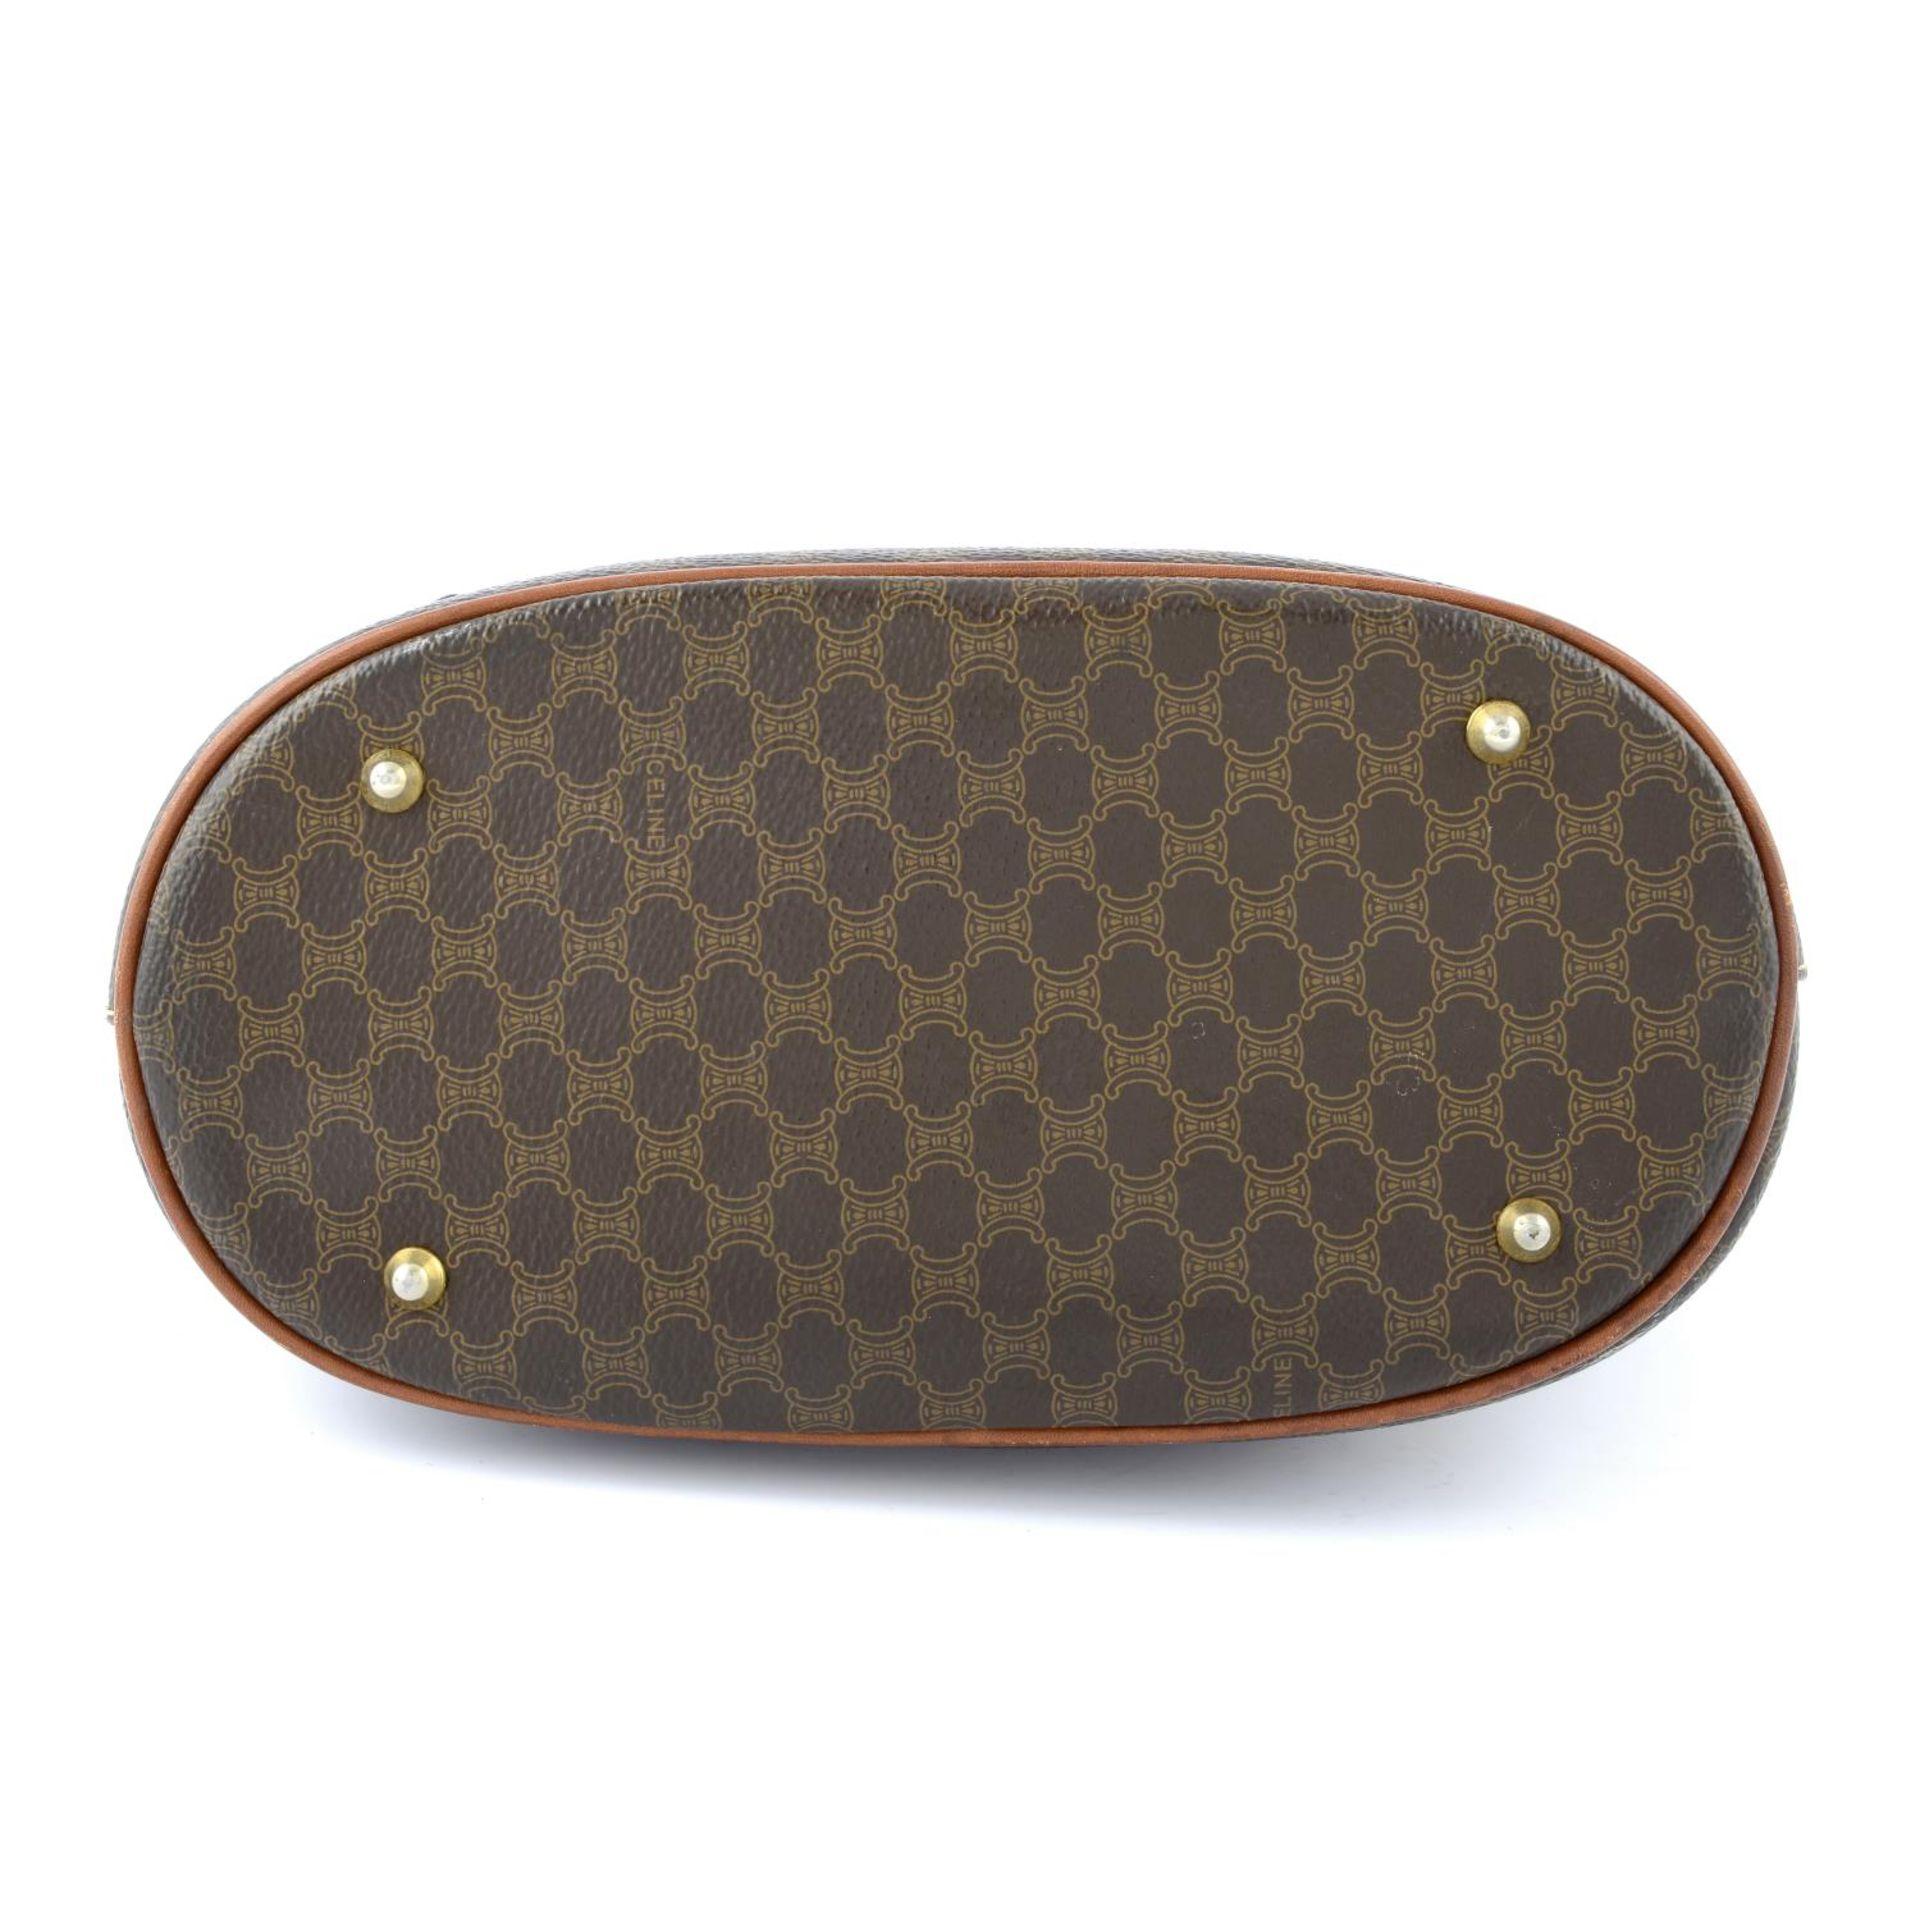 CÉLINE - a Macadam coated canvas handbag. - Image 5 of 5